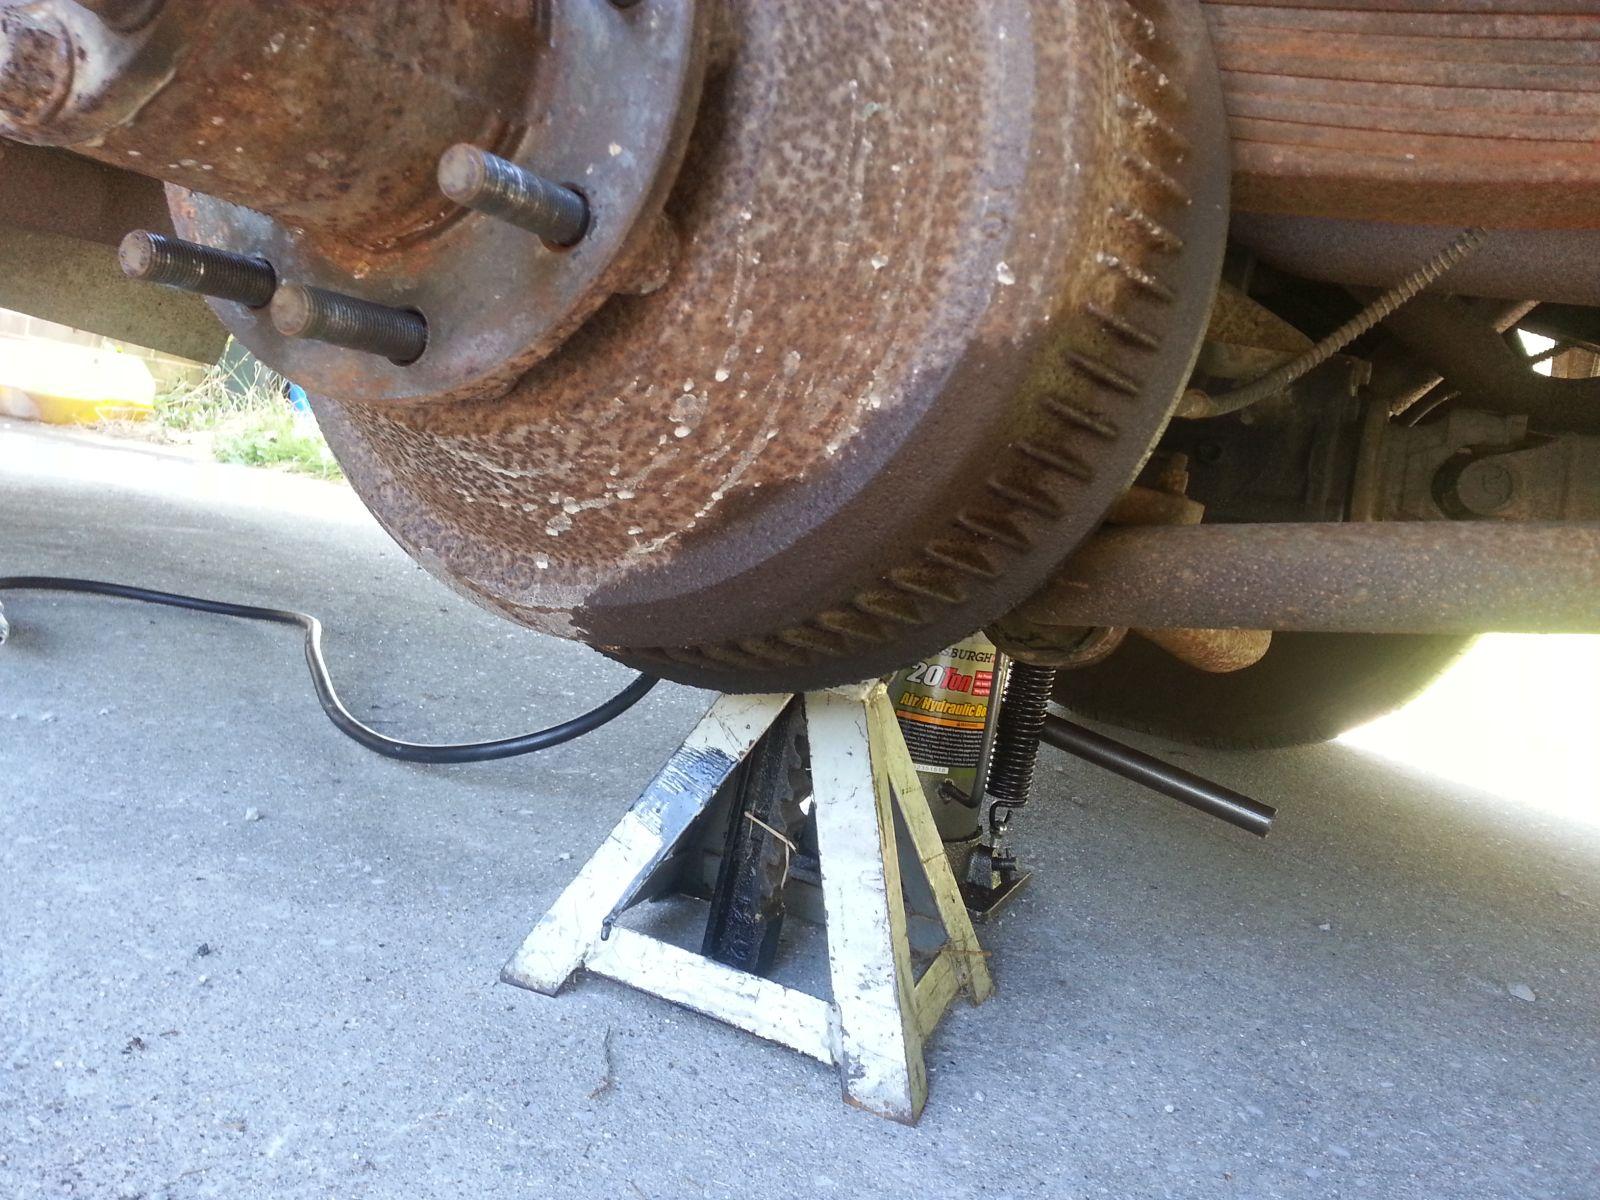 Click image for larger version  Name:peanut-left-rear-brake-drum.jpg Views:72 Size:323.8 KB ID:259896